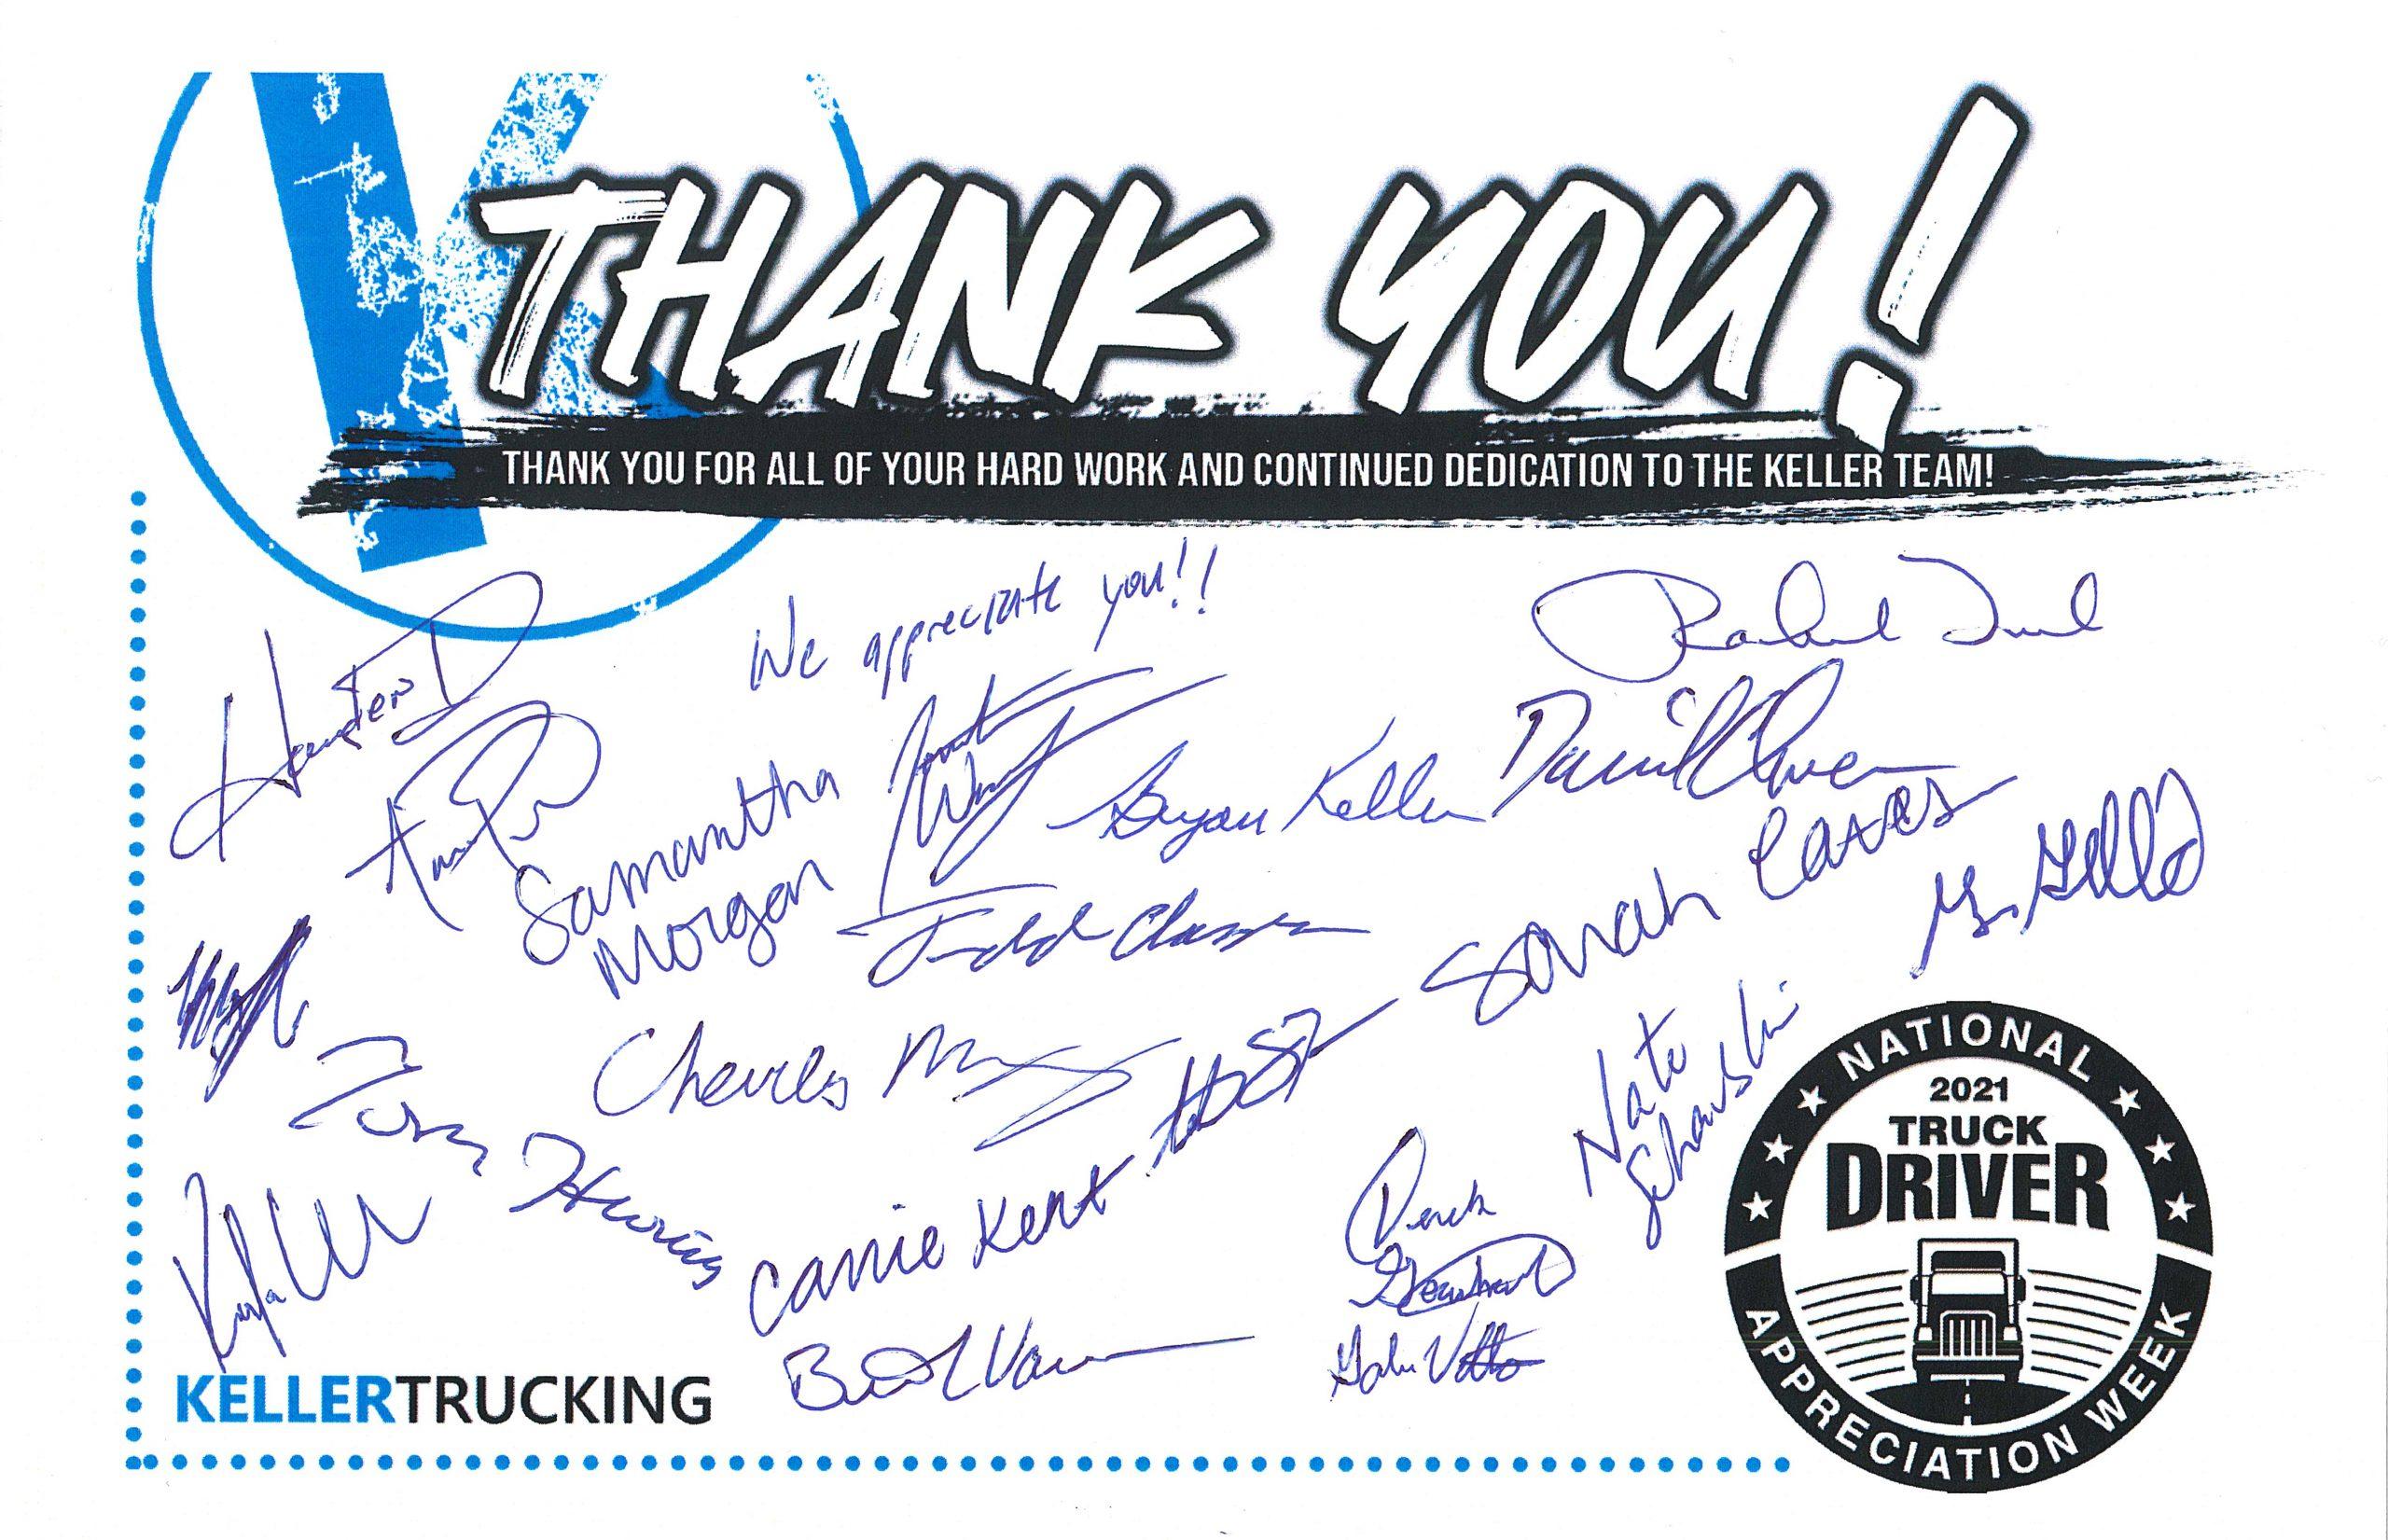 Keller Trucking Thank You Card